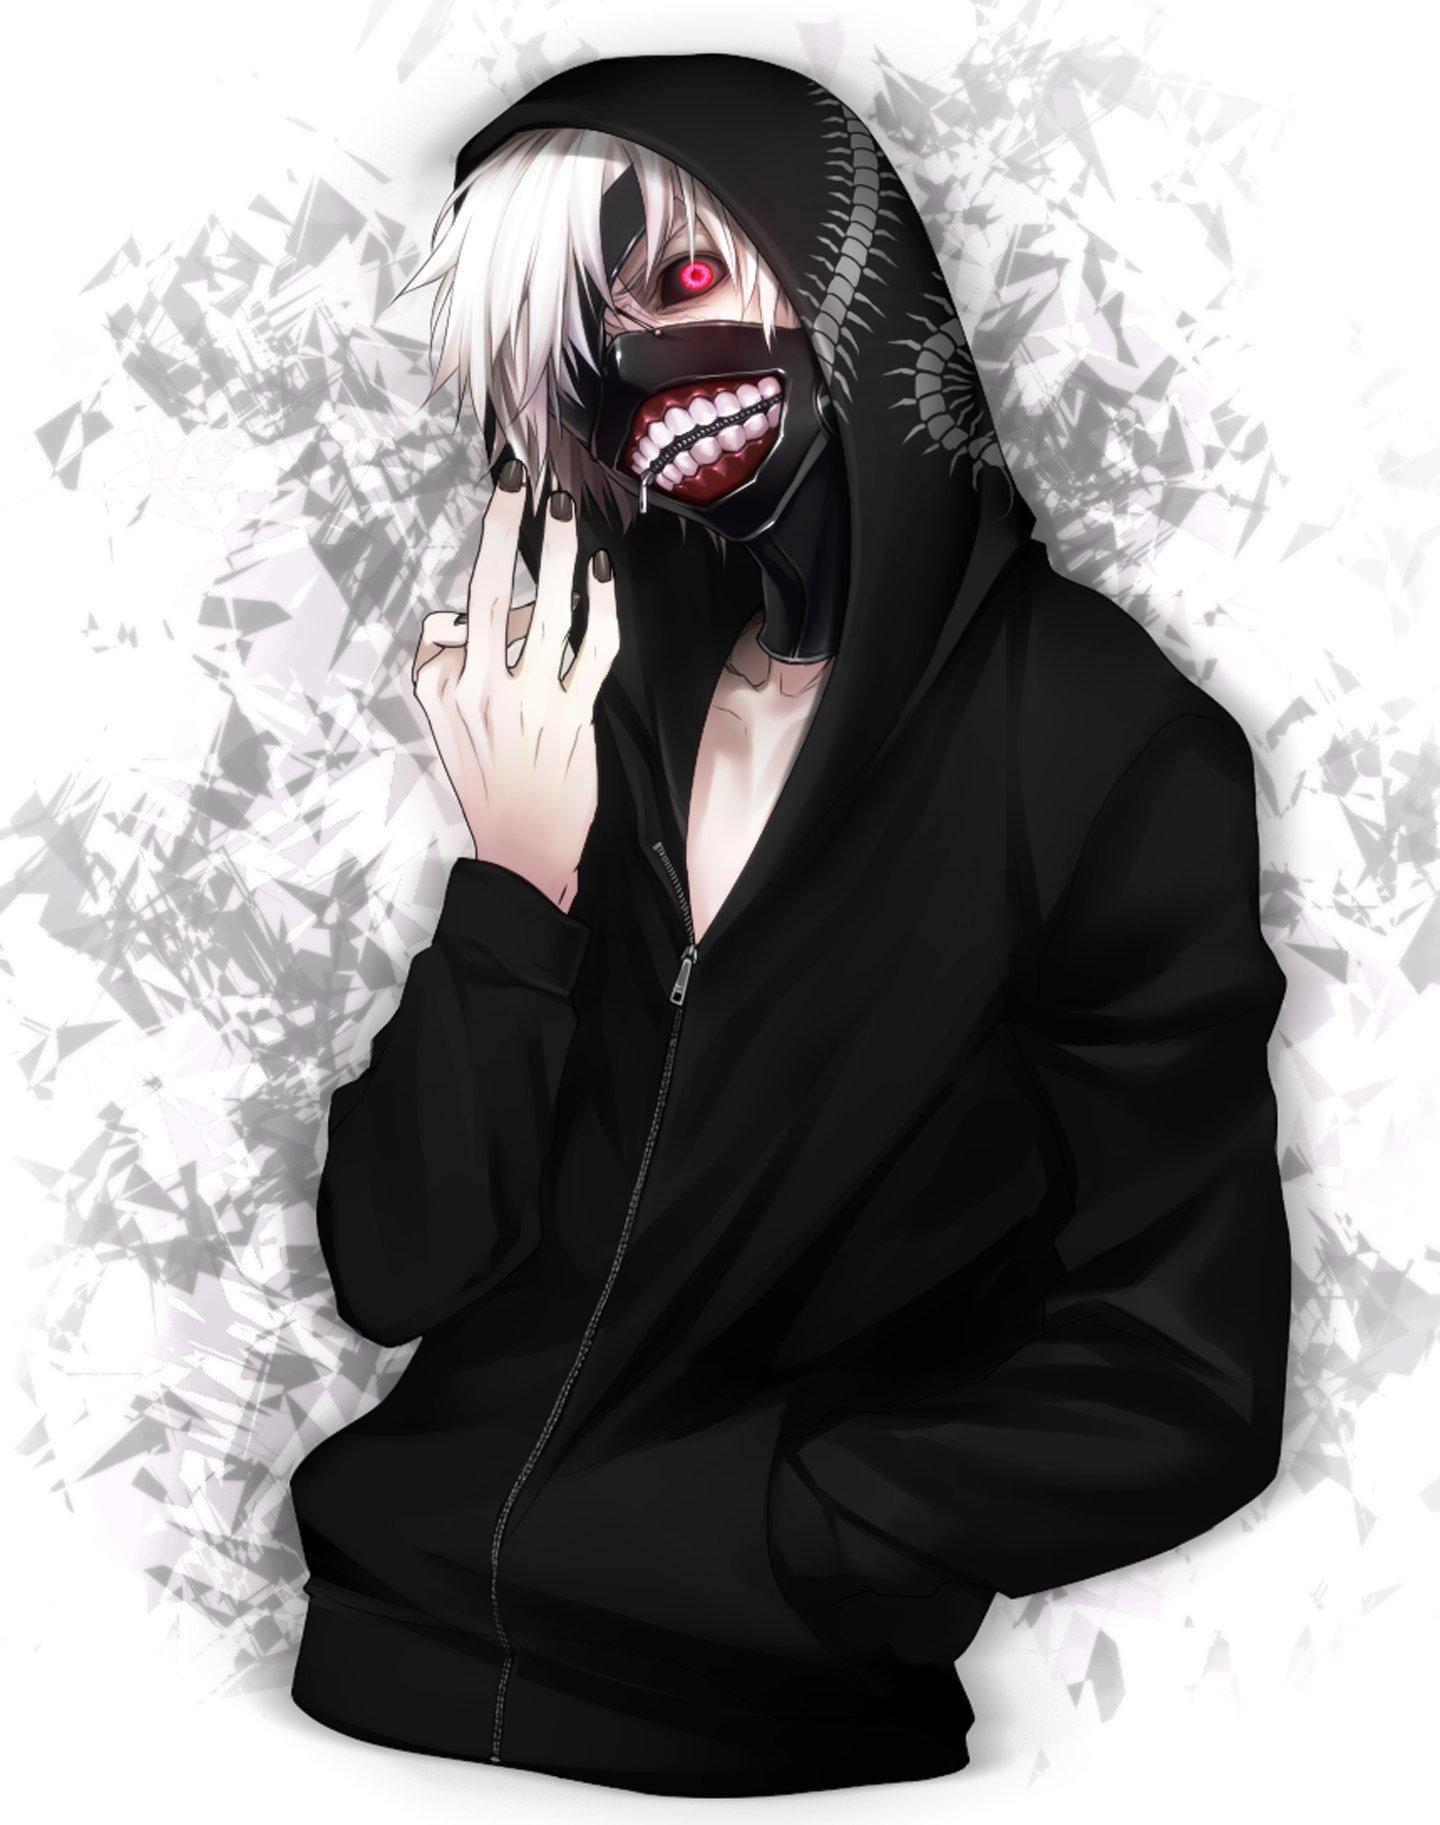 Demon anime boy devil red eyes wallpaper | 1440x1825 ...